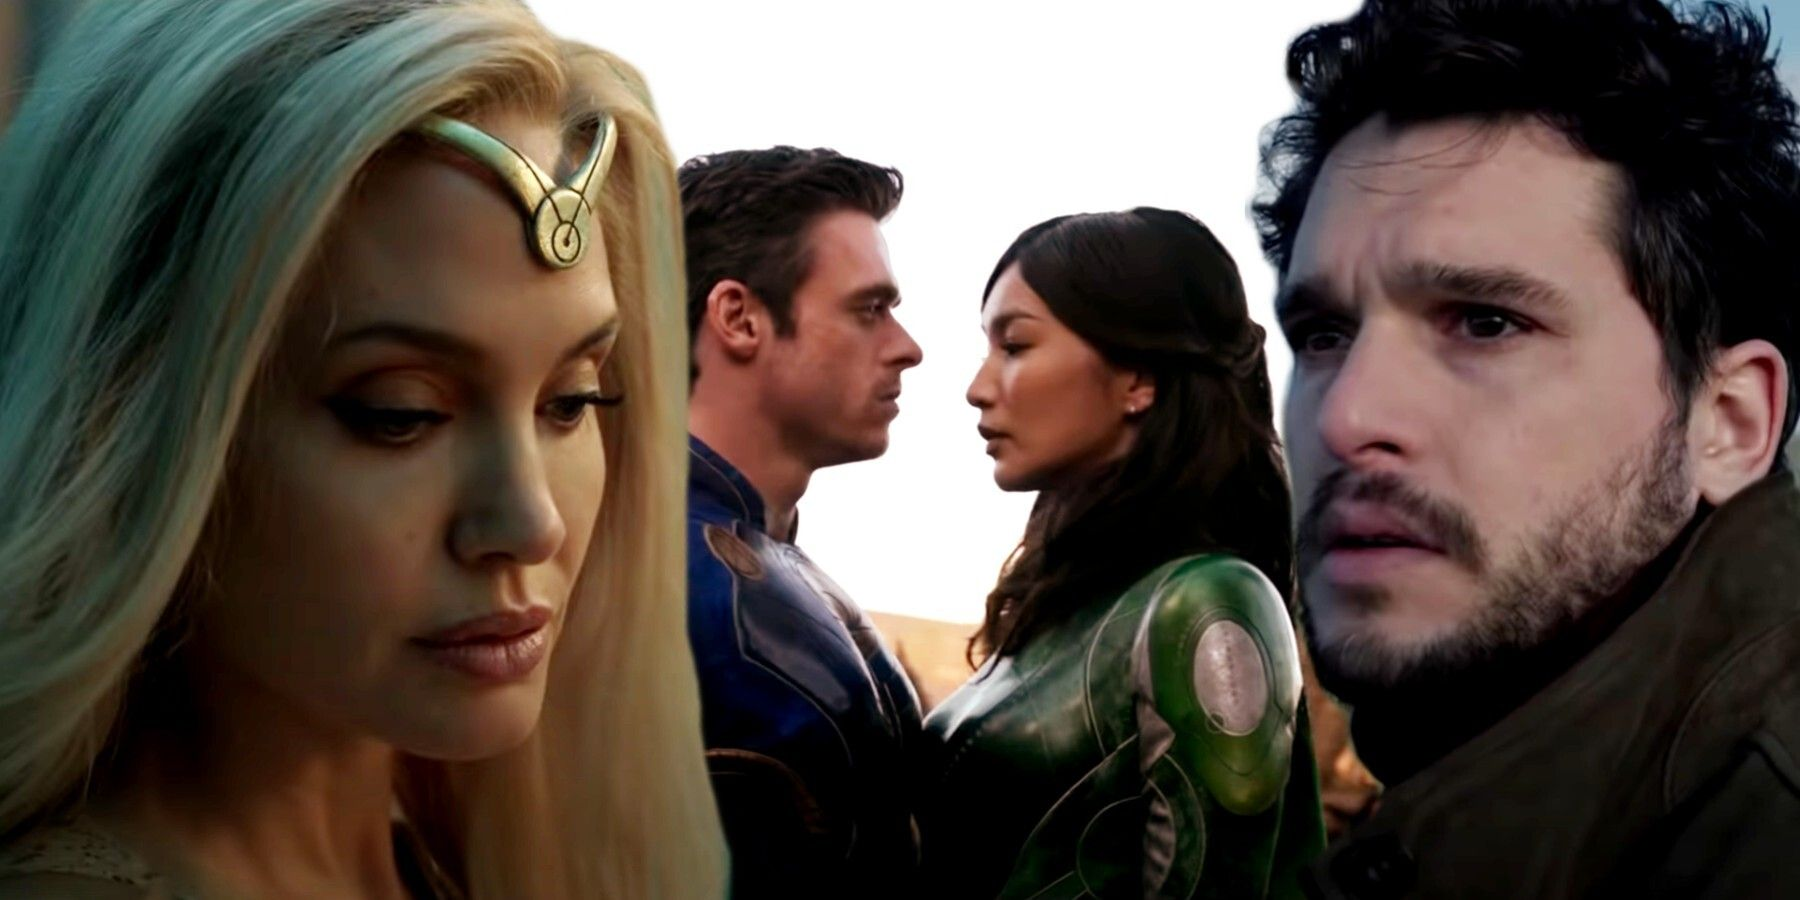 Eternals Trailer Breakdown: 10 Story Details & Marvel Secrets You Missed